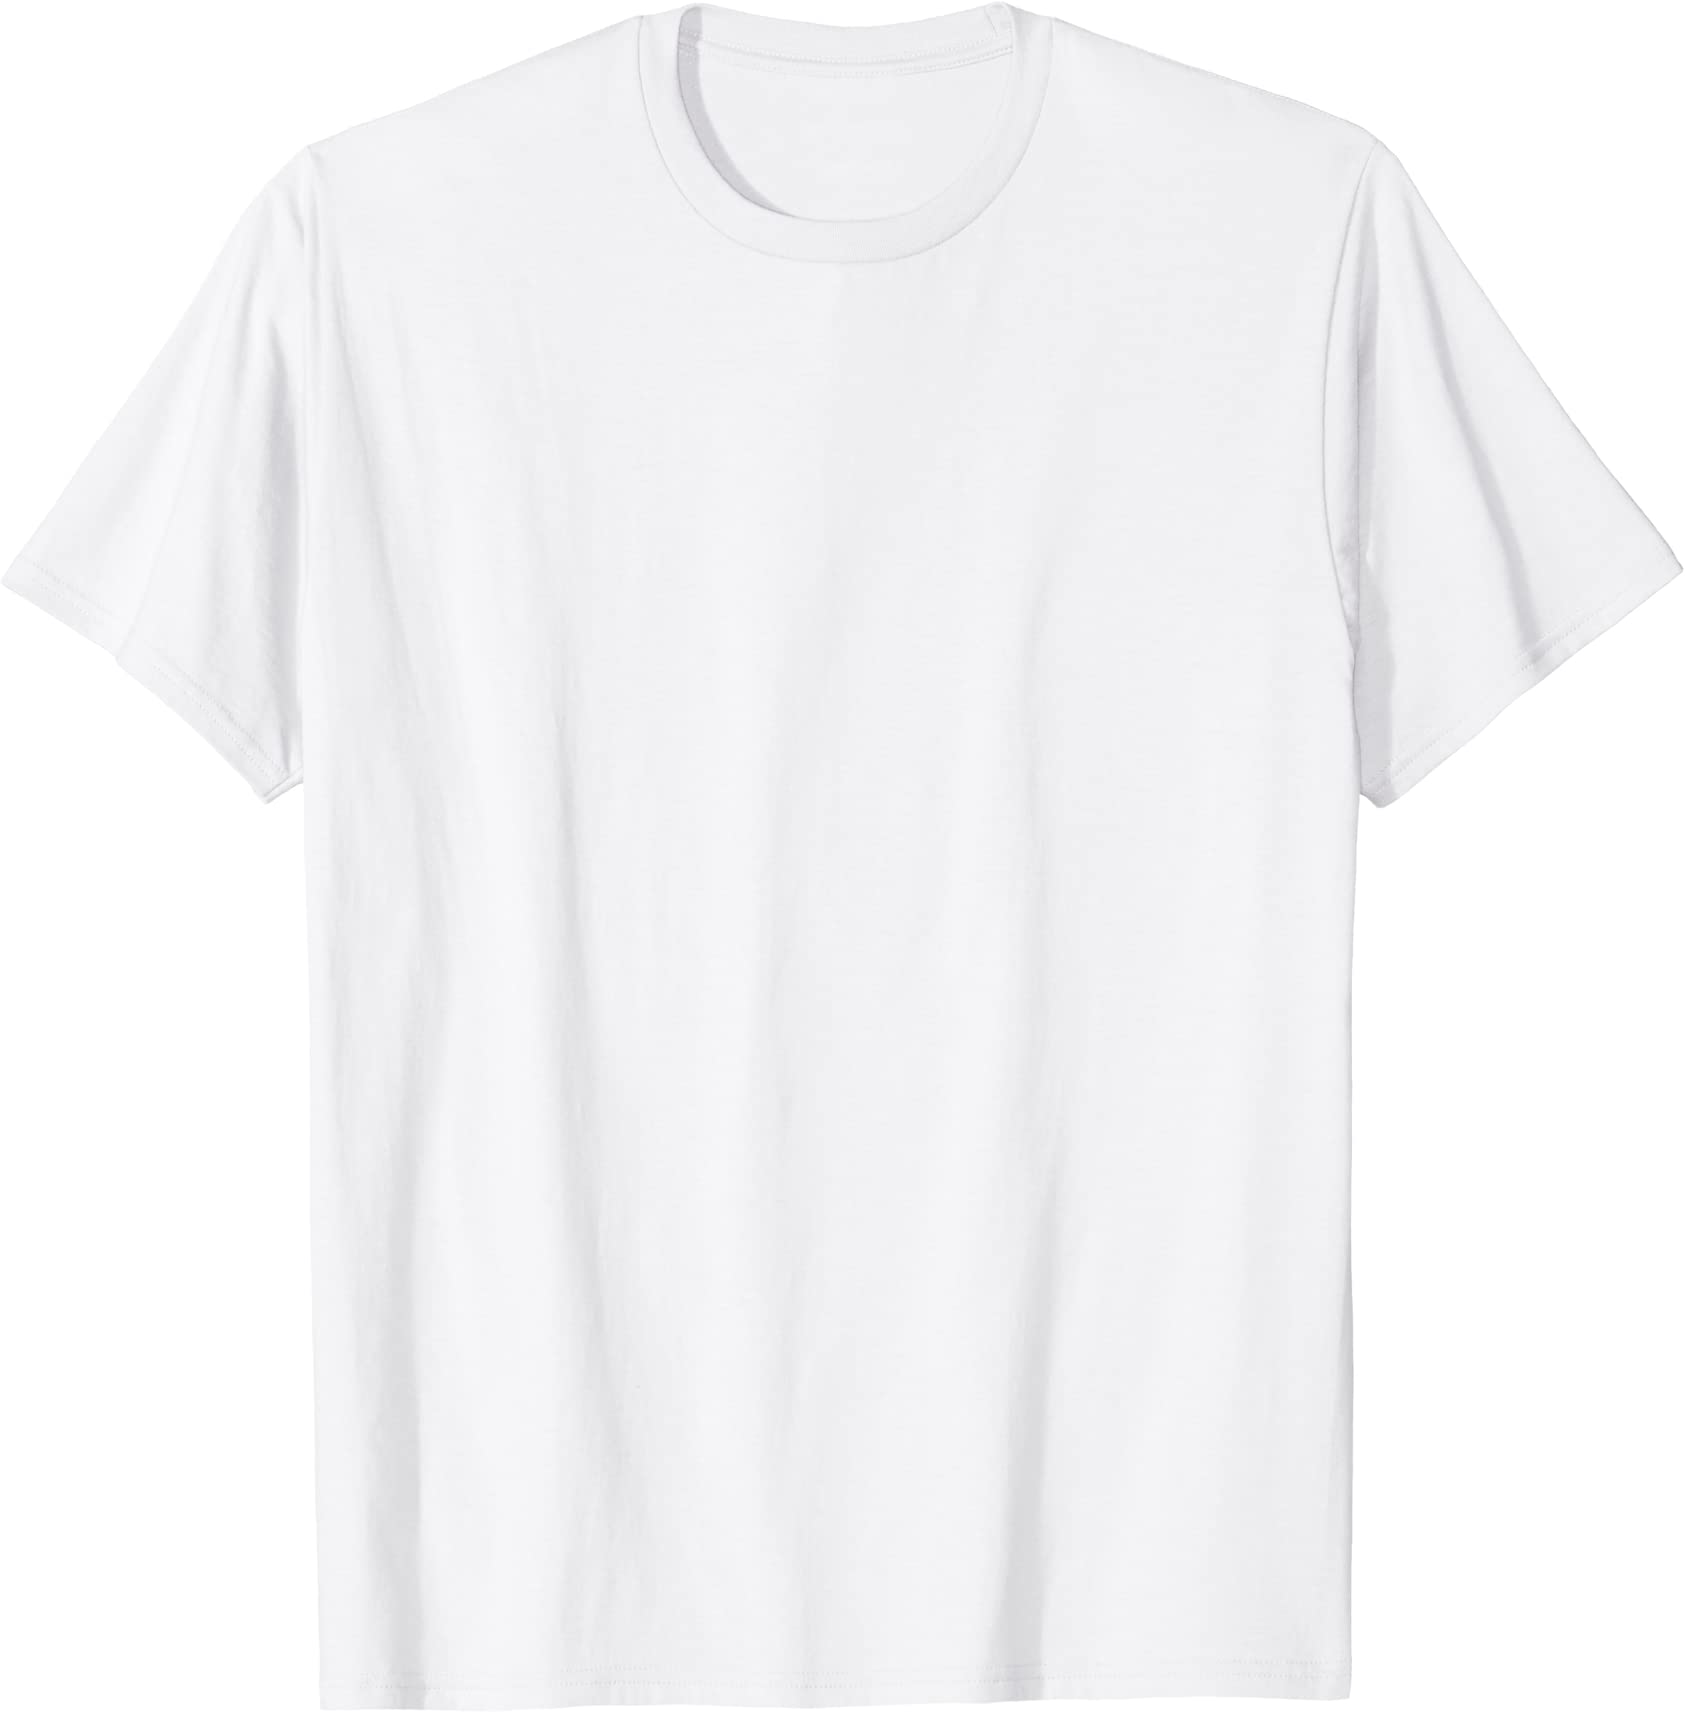 Tee Shirt History Teacher Warning Shirt Clothing